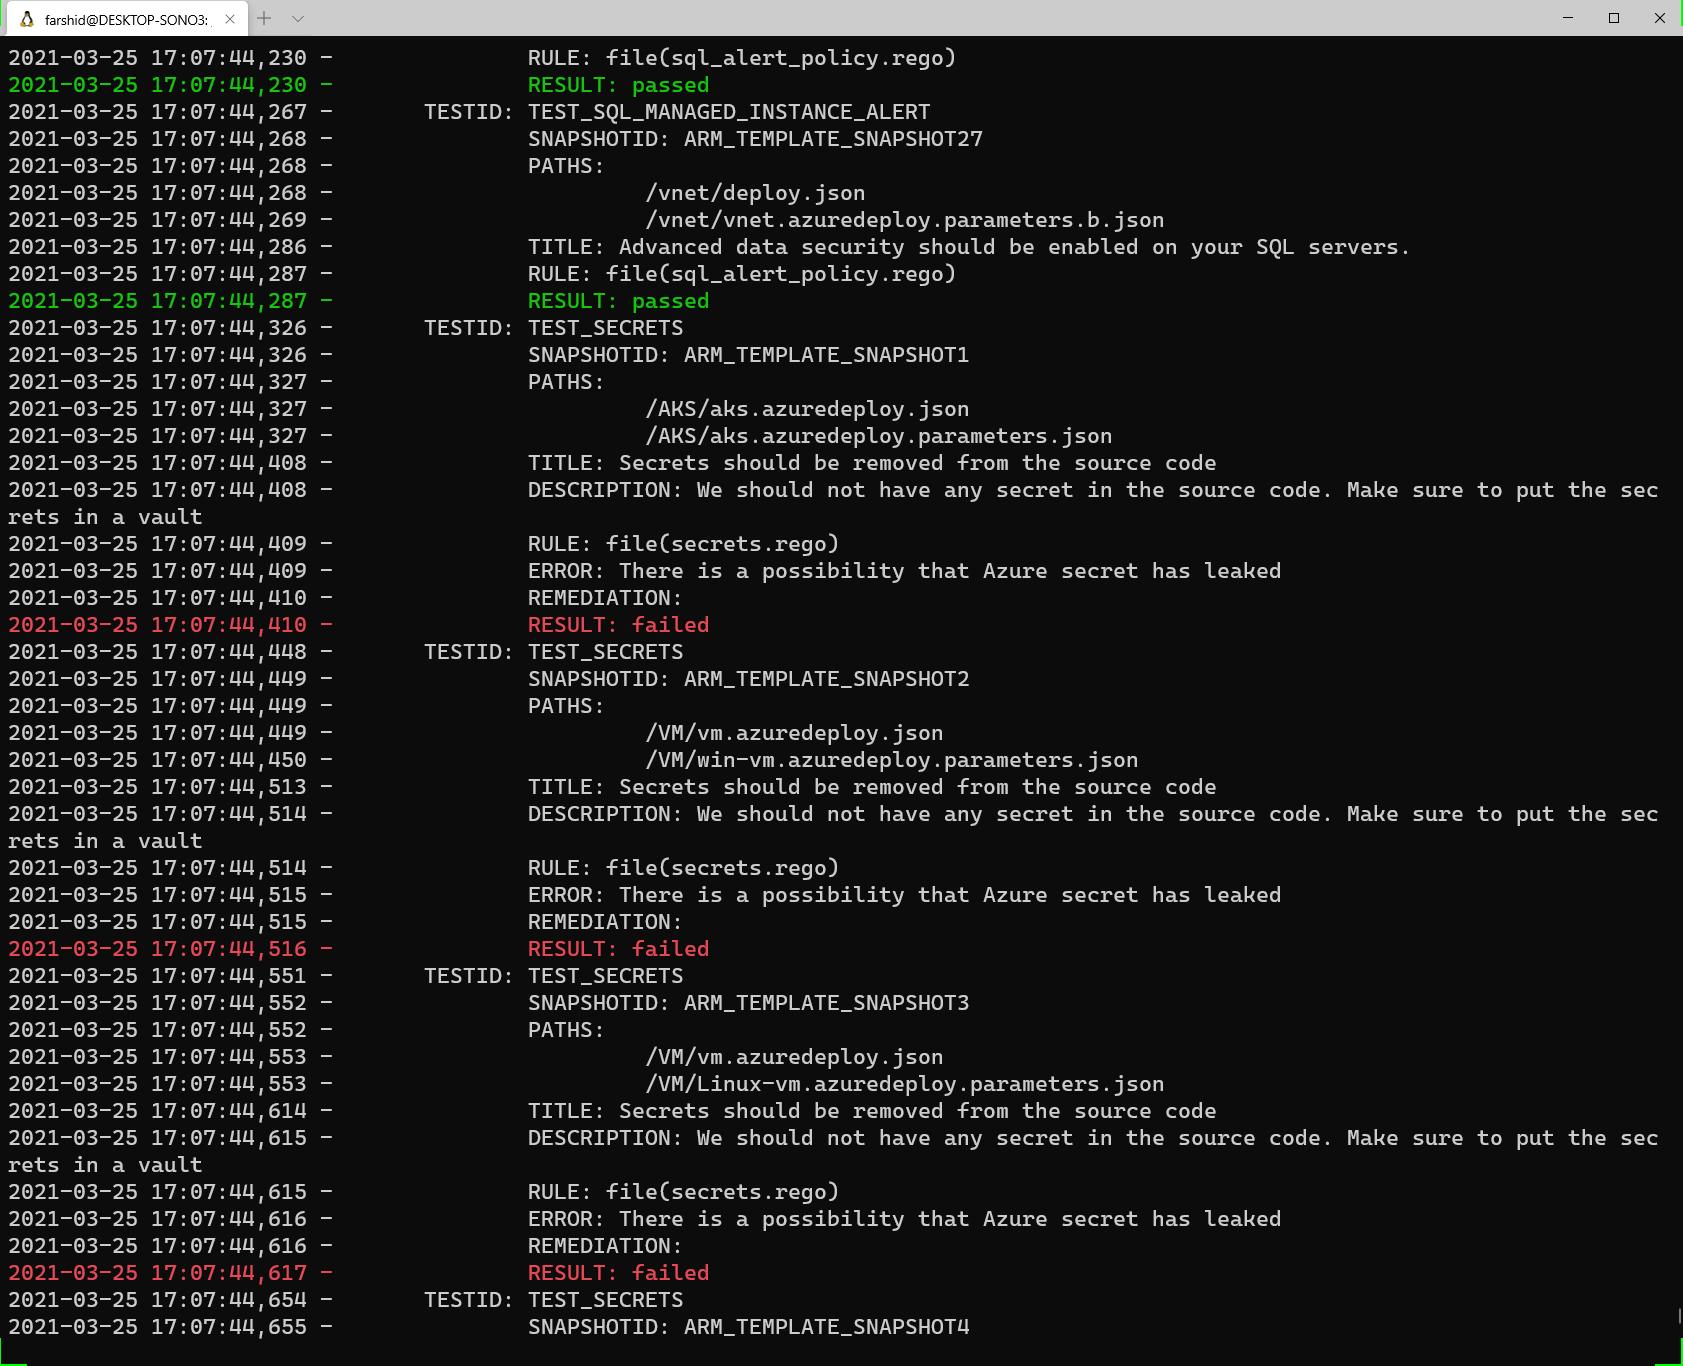 Azure IaC Security scan